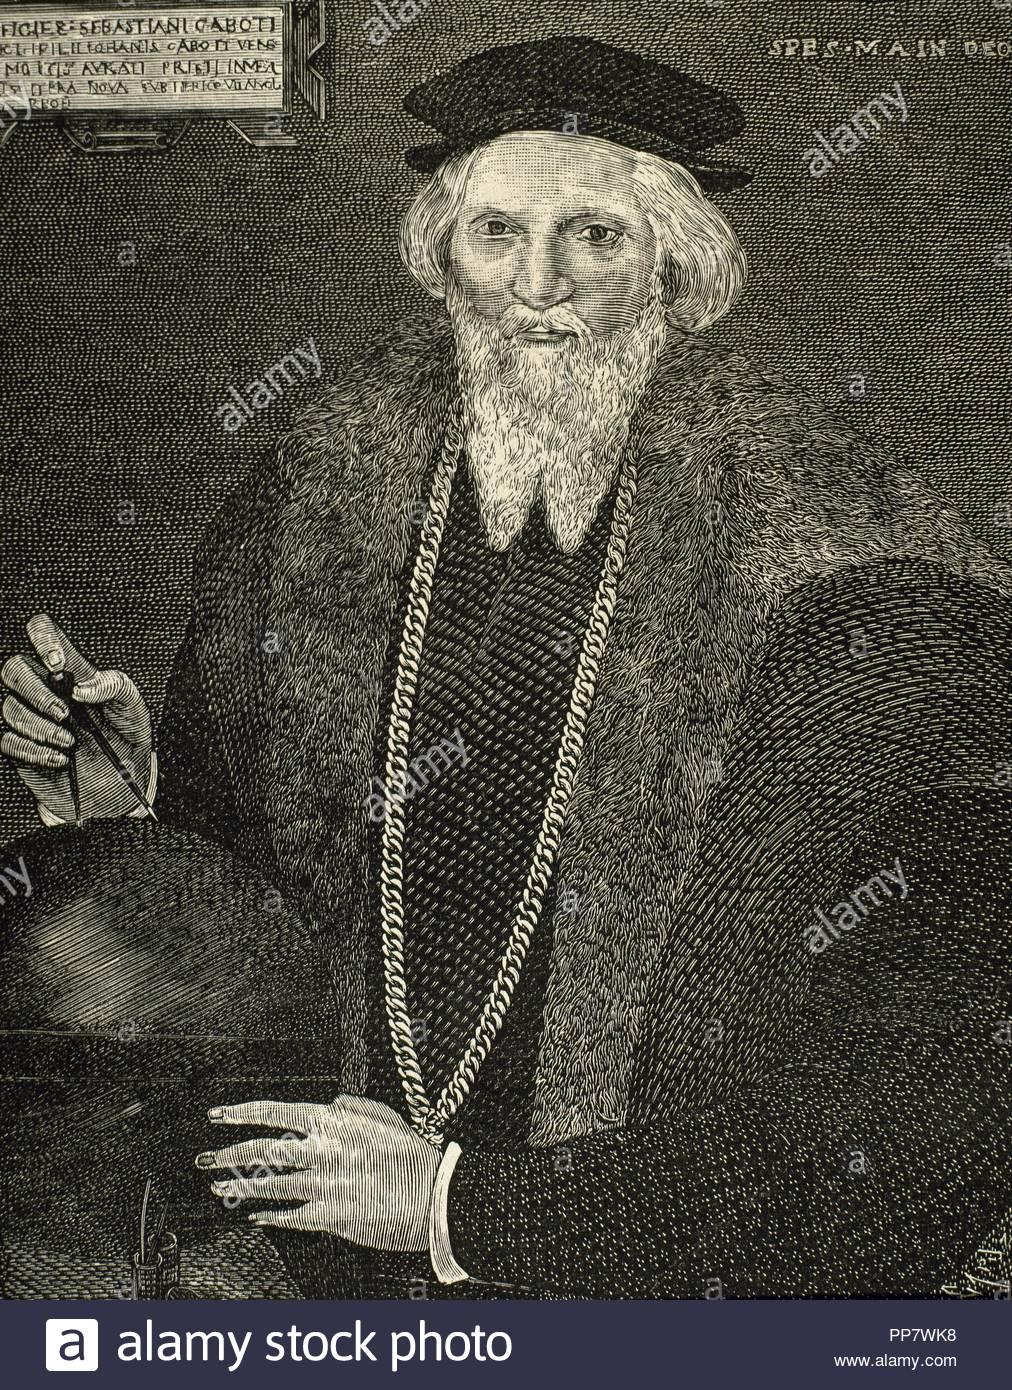 1557). Italian explorer. Portrait. Engraving by Capuz.